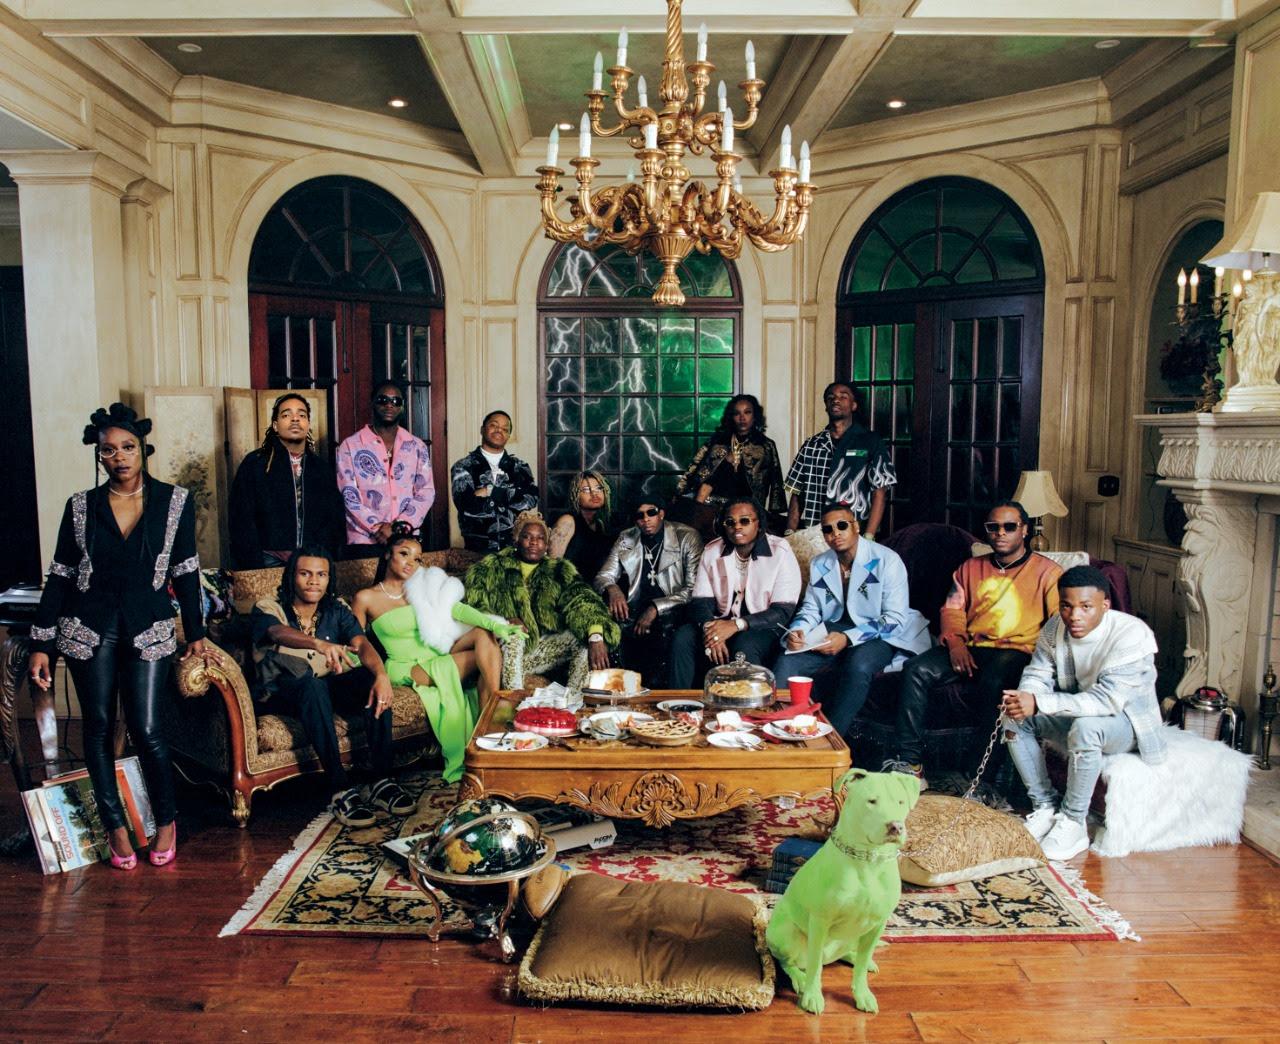 "Slime language 2"" de young thug es #1 en el chart de Rolling Stone"